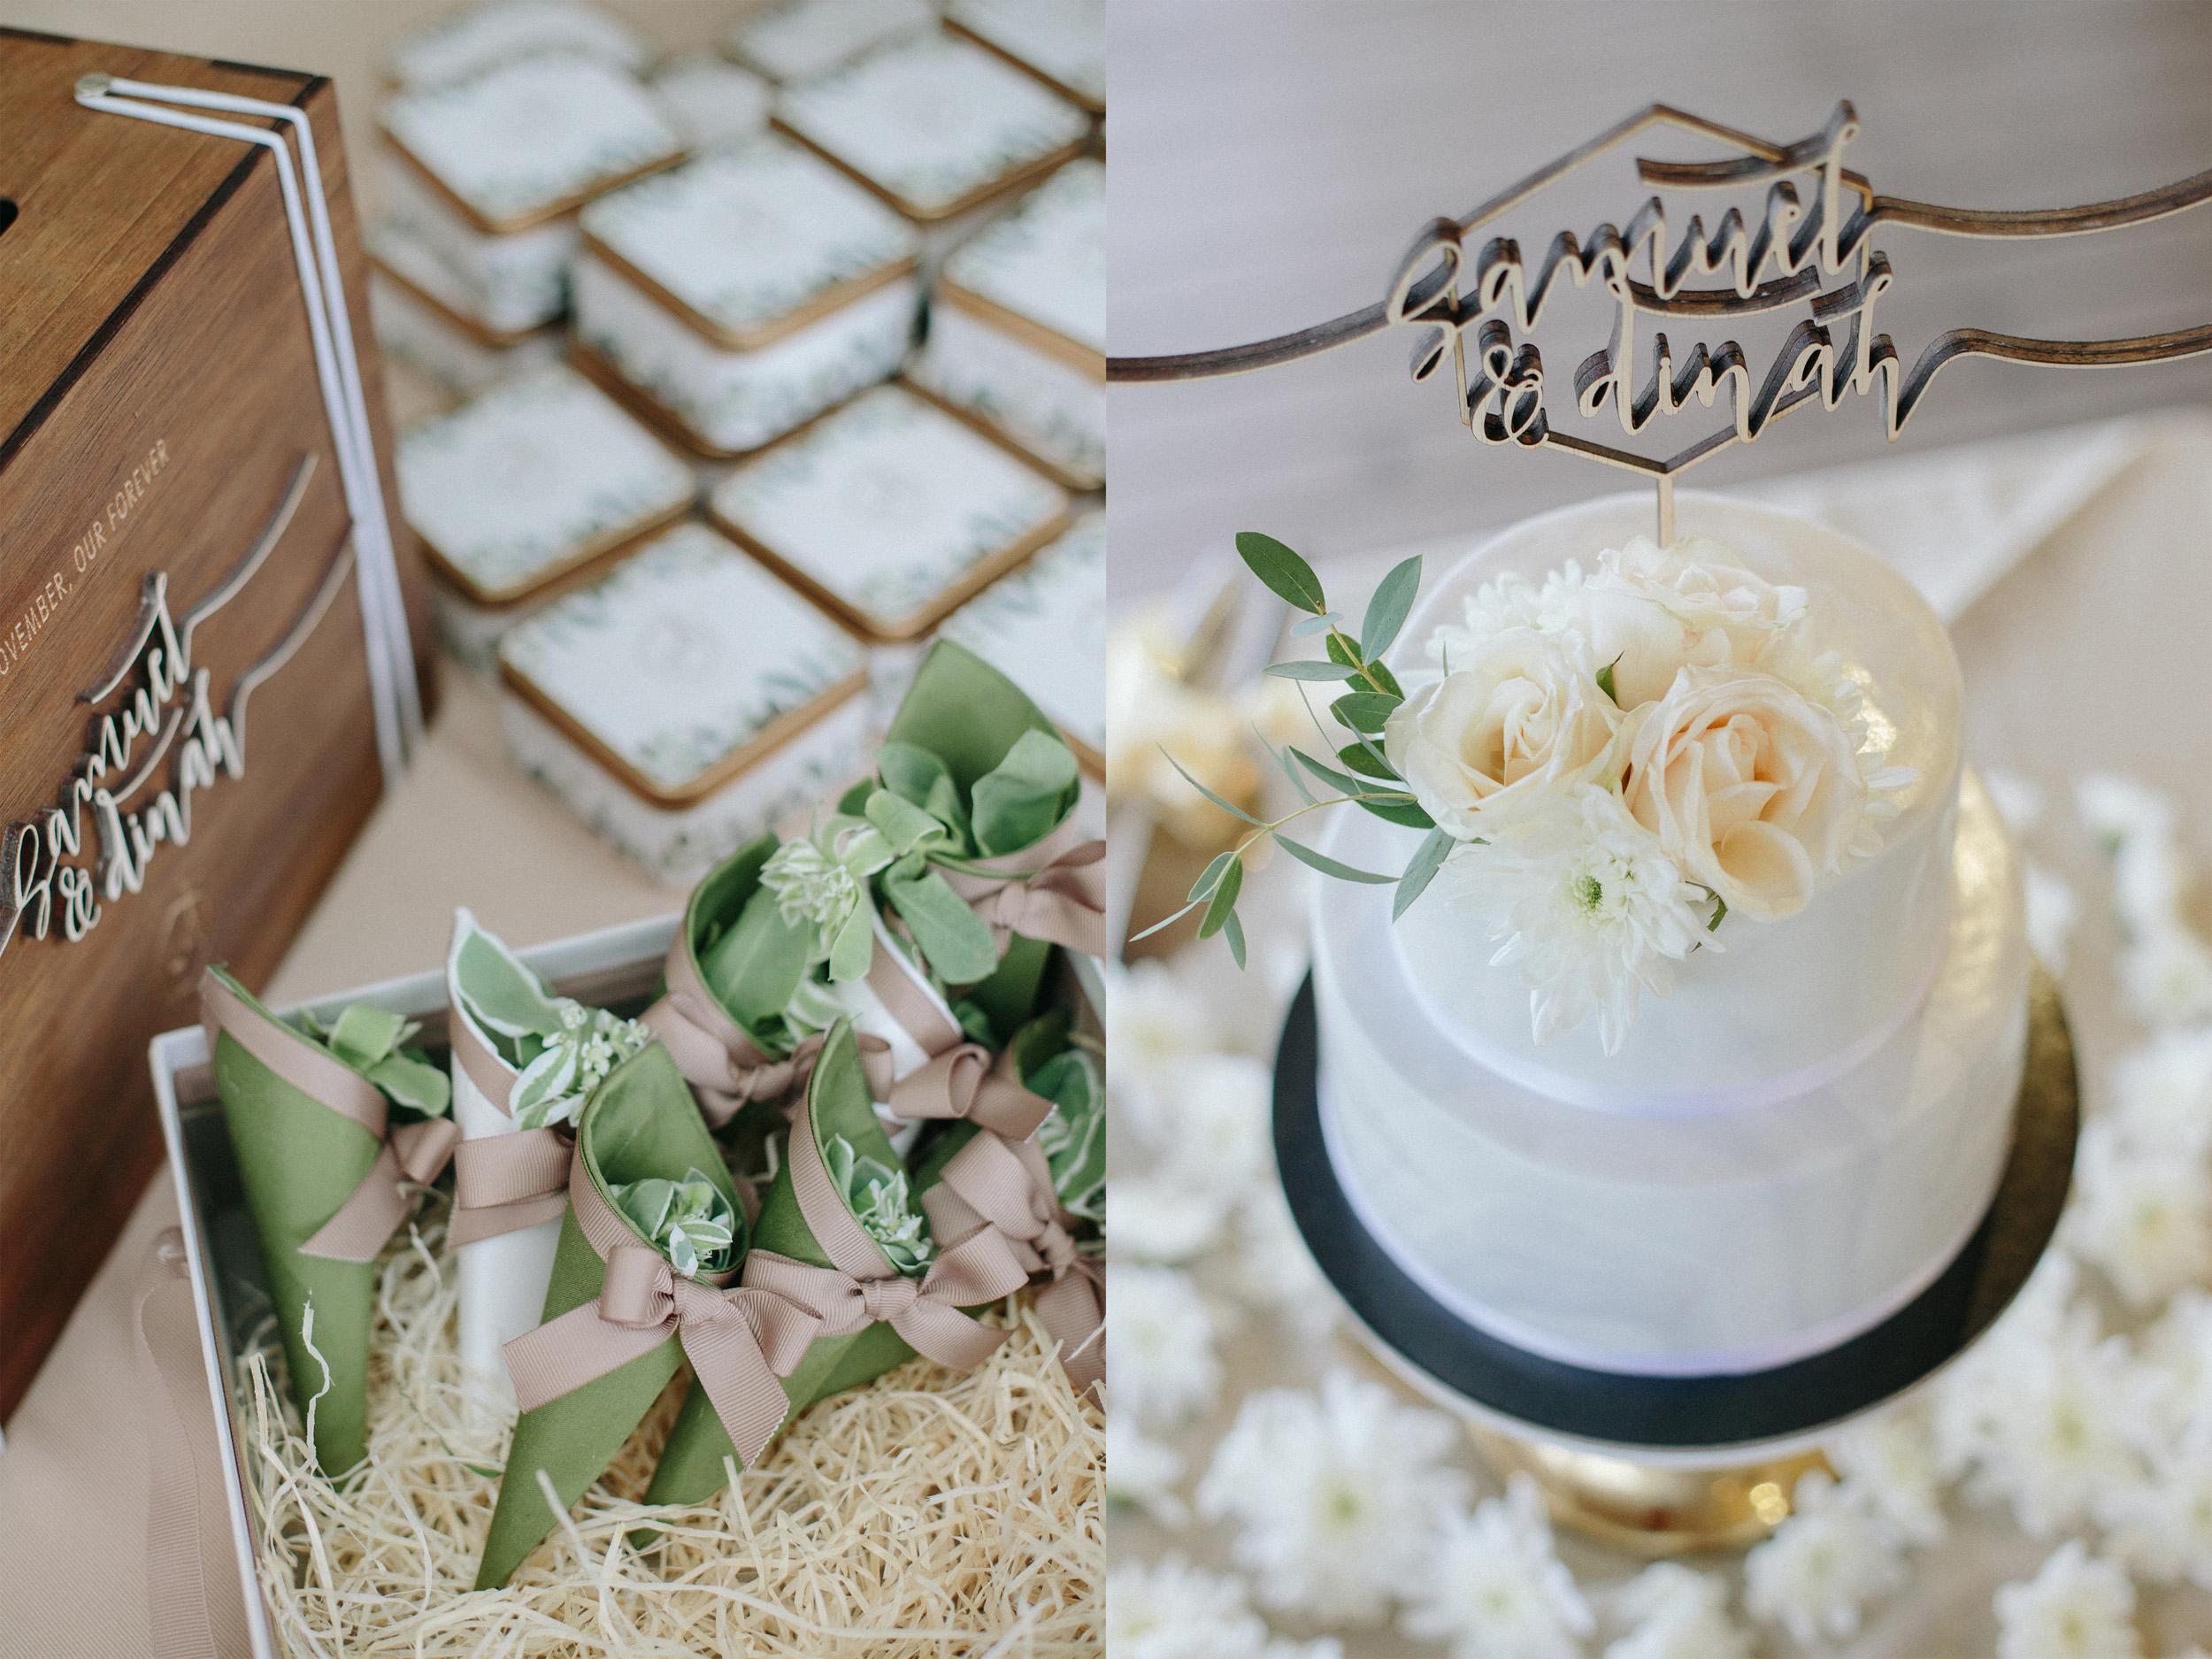 singapore-wedding-photographer-photography-wmt2017-117.jpg